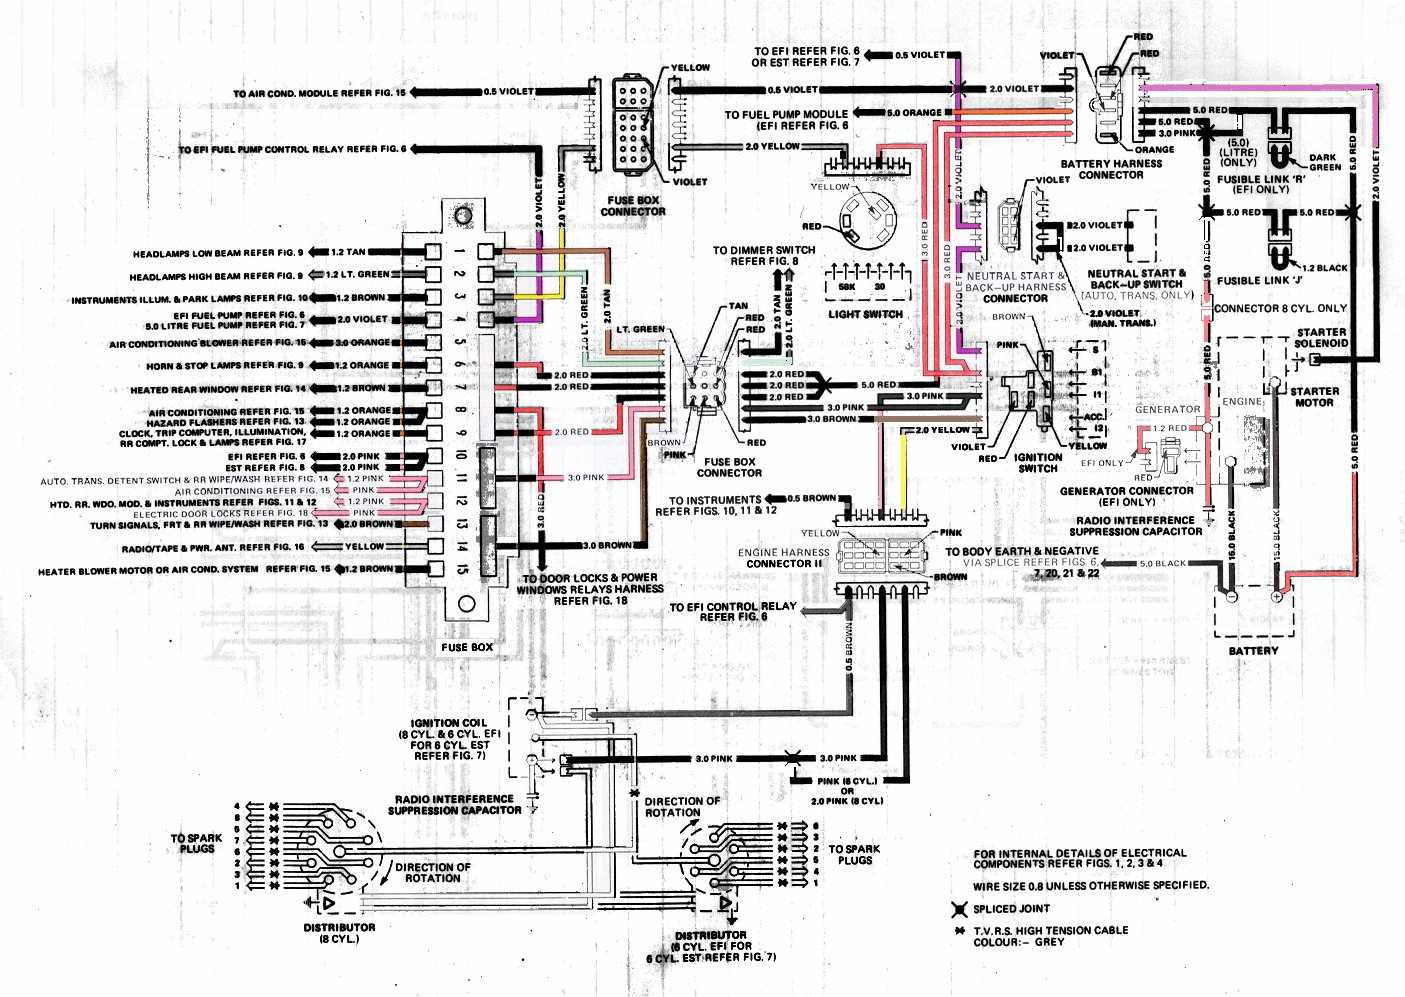 Famous Inverter Transfer Switch Wiring scotts speedy green 3000 manual